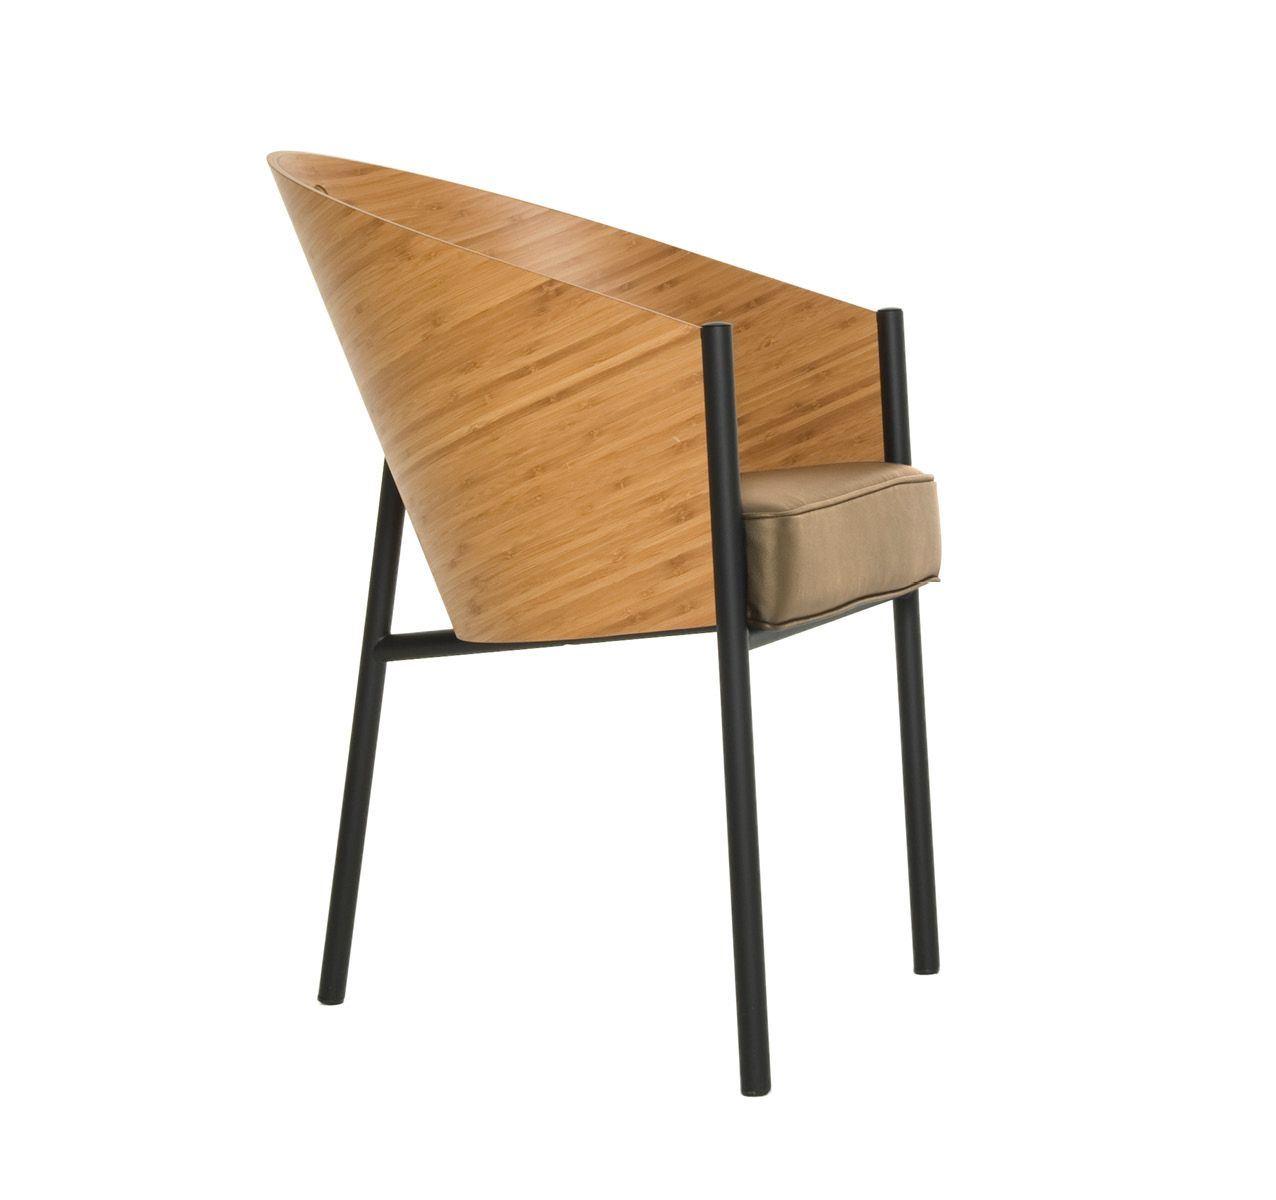 Bamboo [+€149,00]